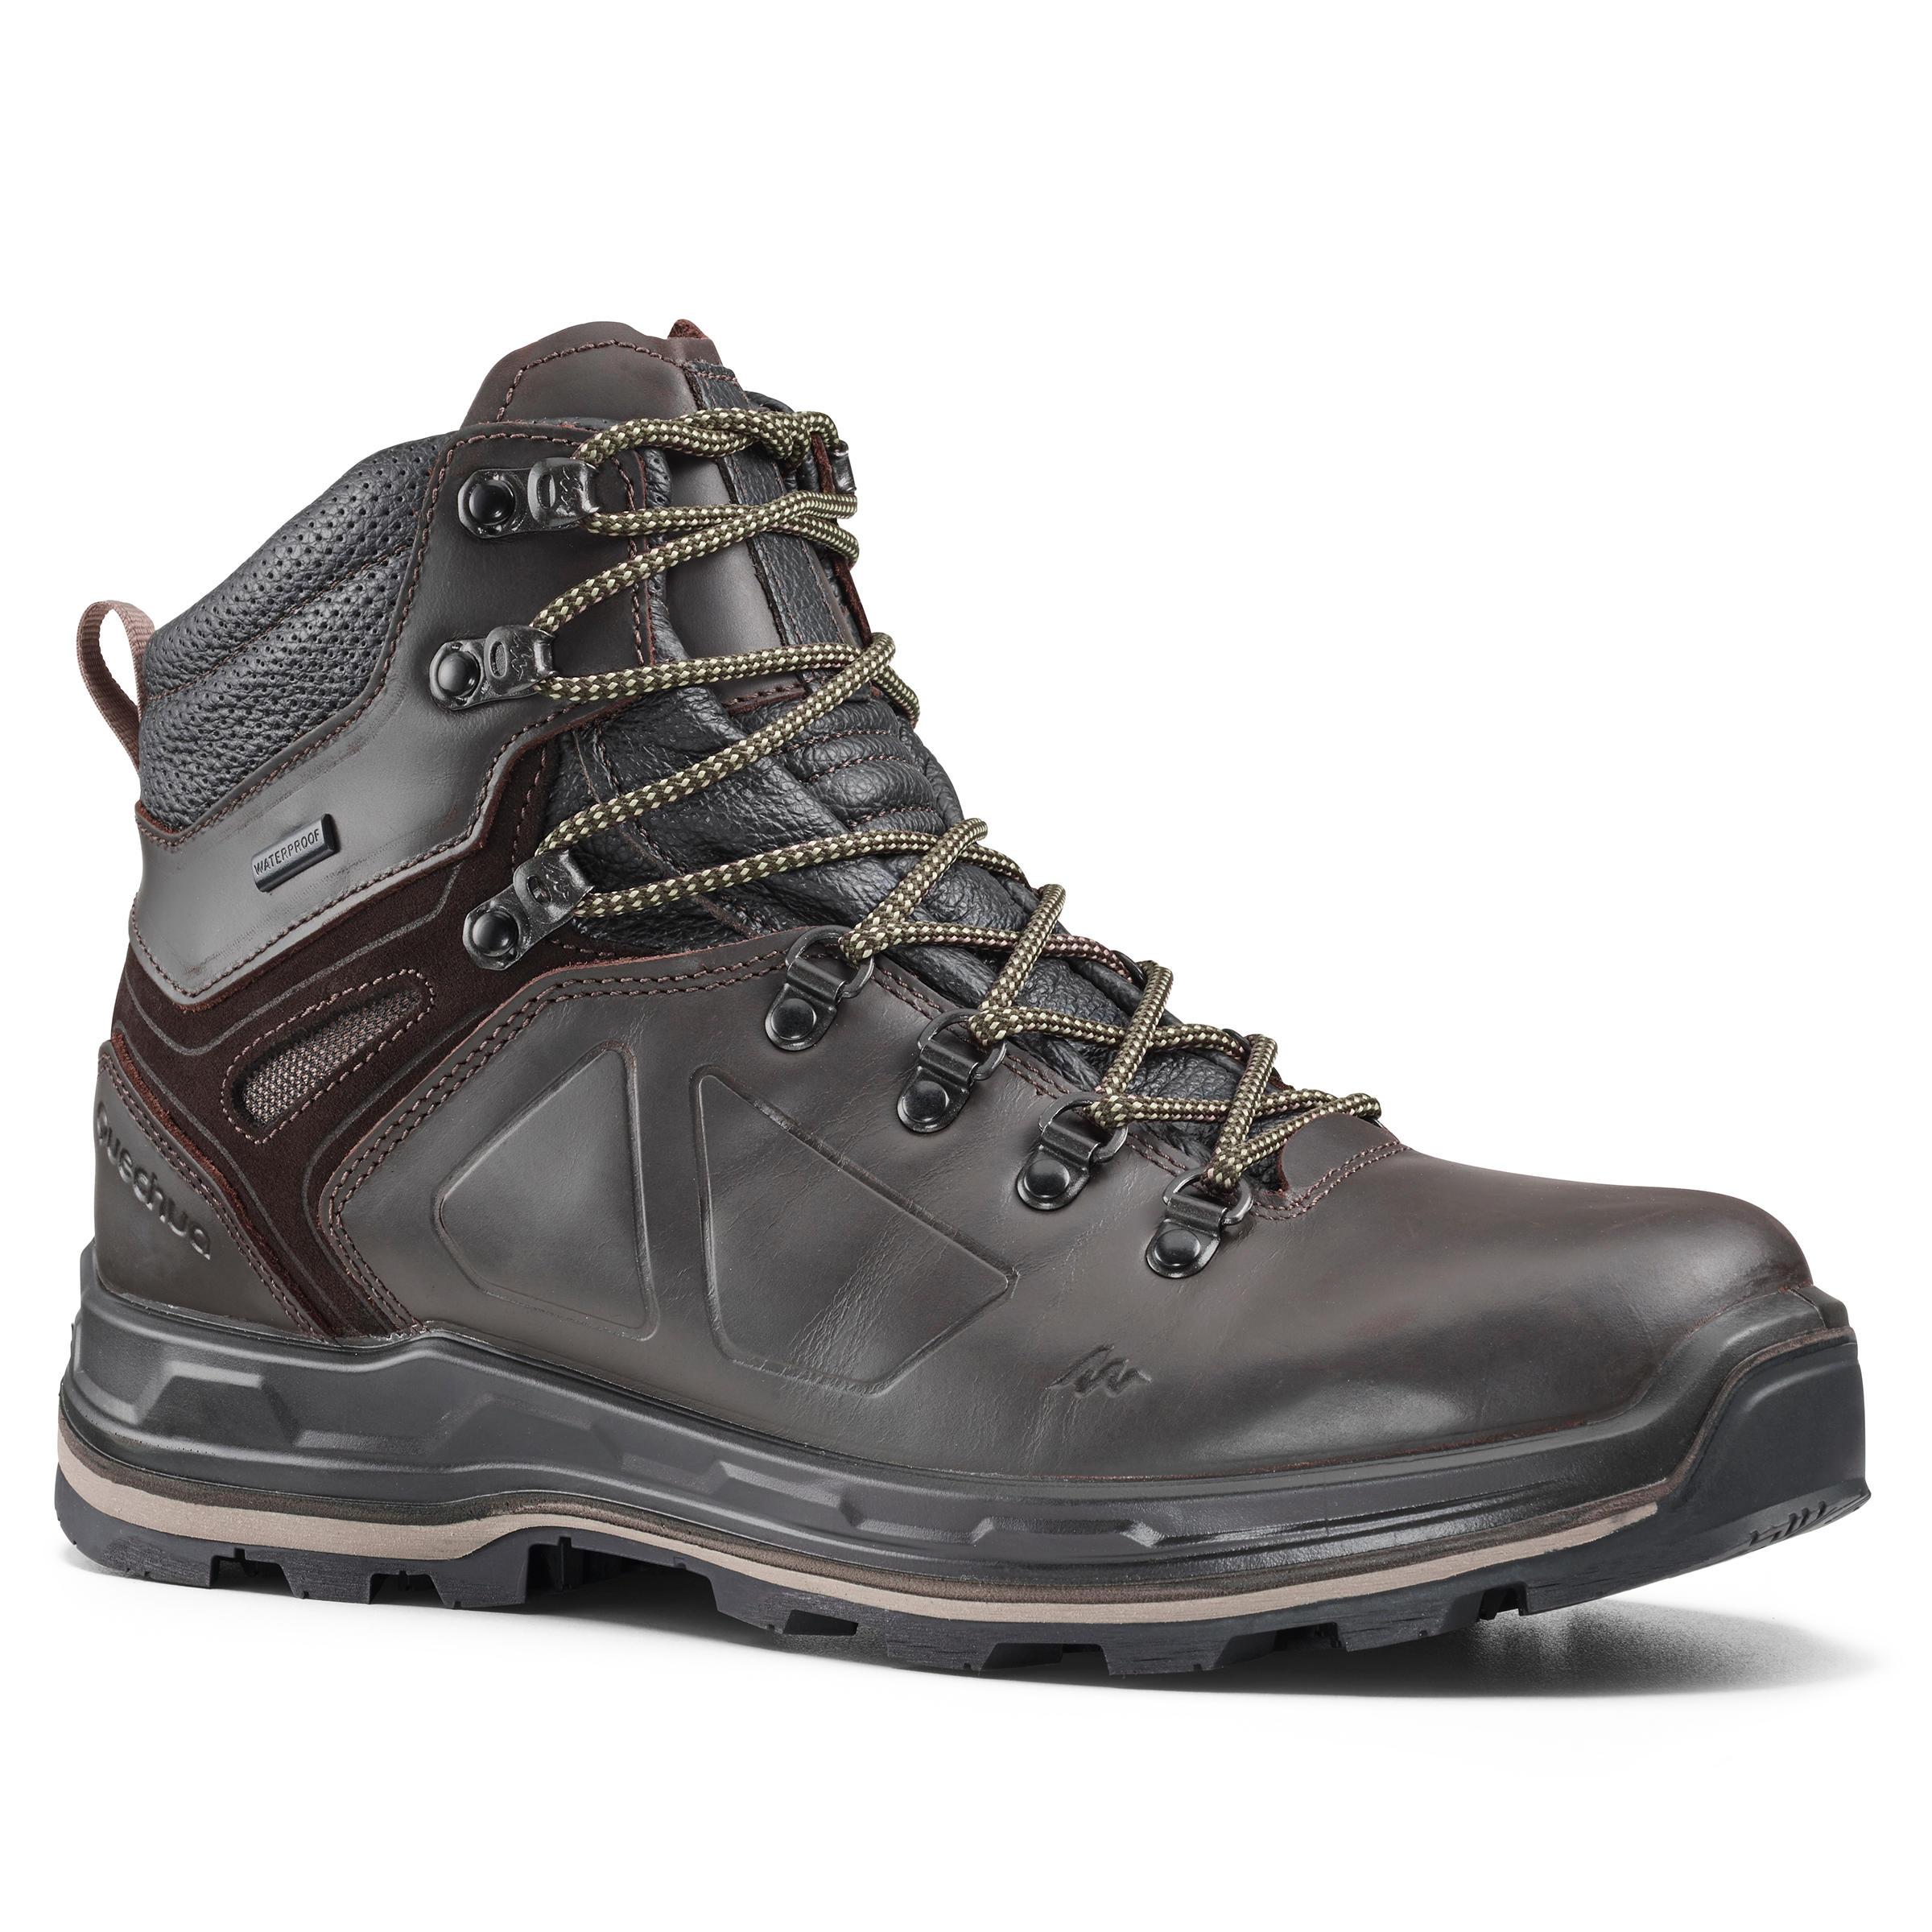 Trekkingschuhe Trek500 Herren   Schuhe > Outdoorschuhe > Trekkingschuhe   Quechua